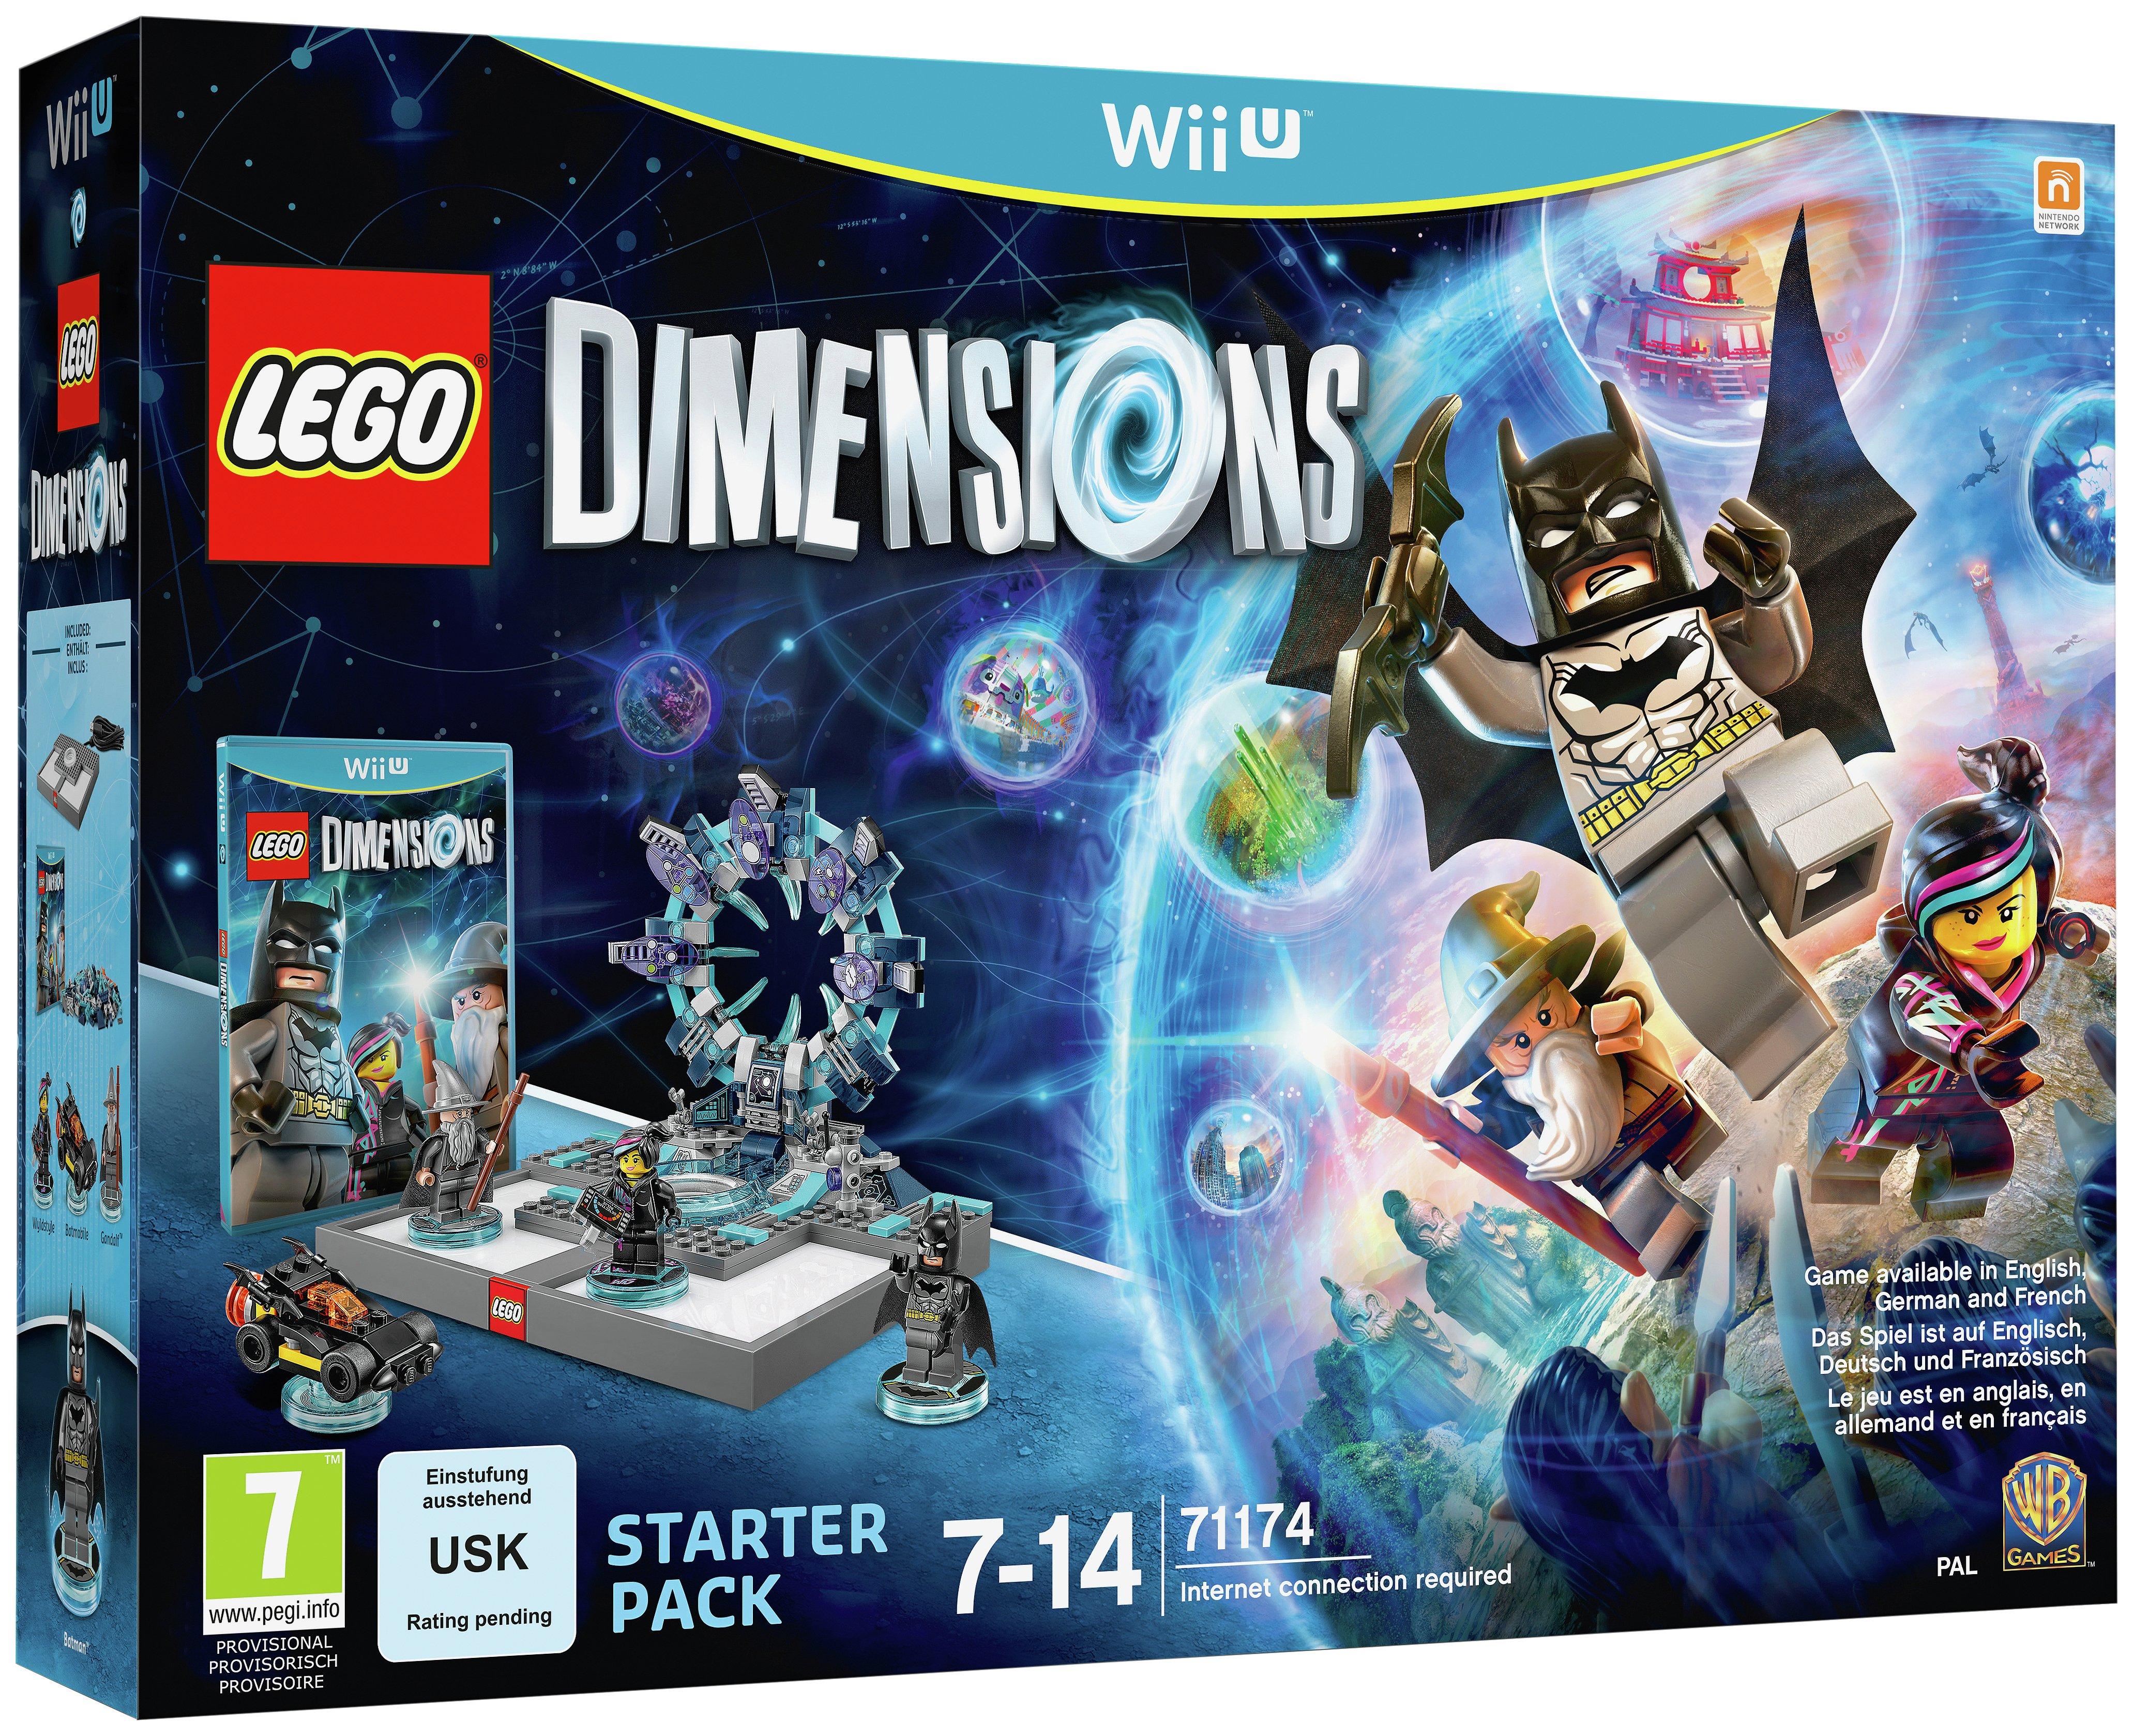 LEGO dimensions LEGO - Dimensions Starter Pack - Wii U Game